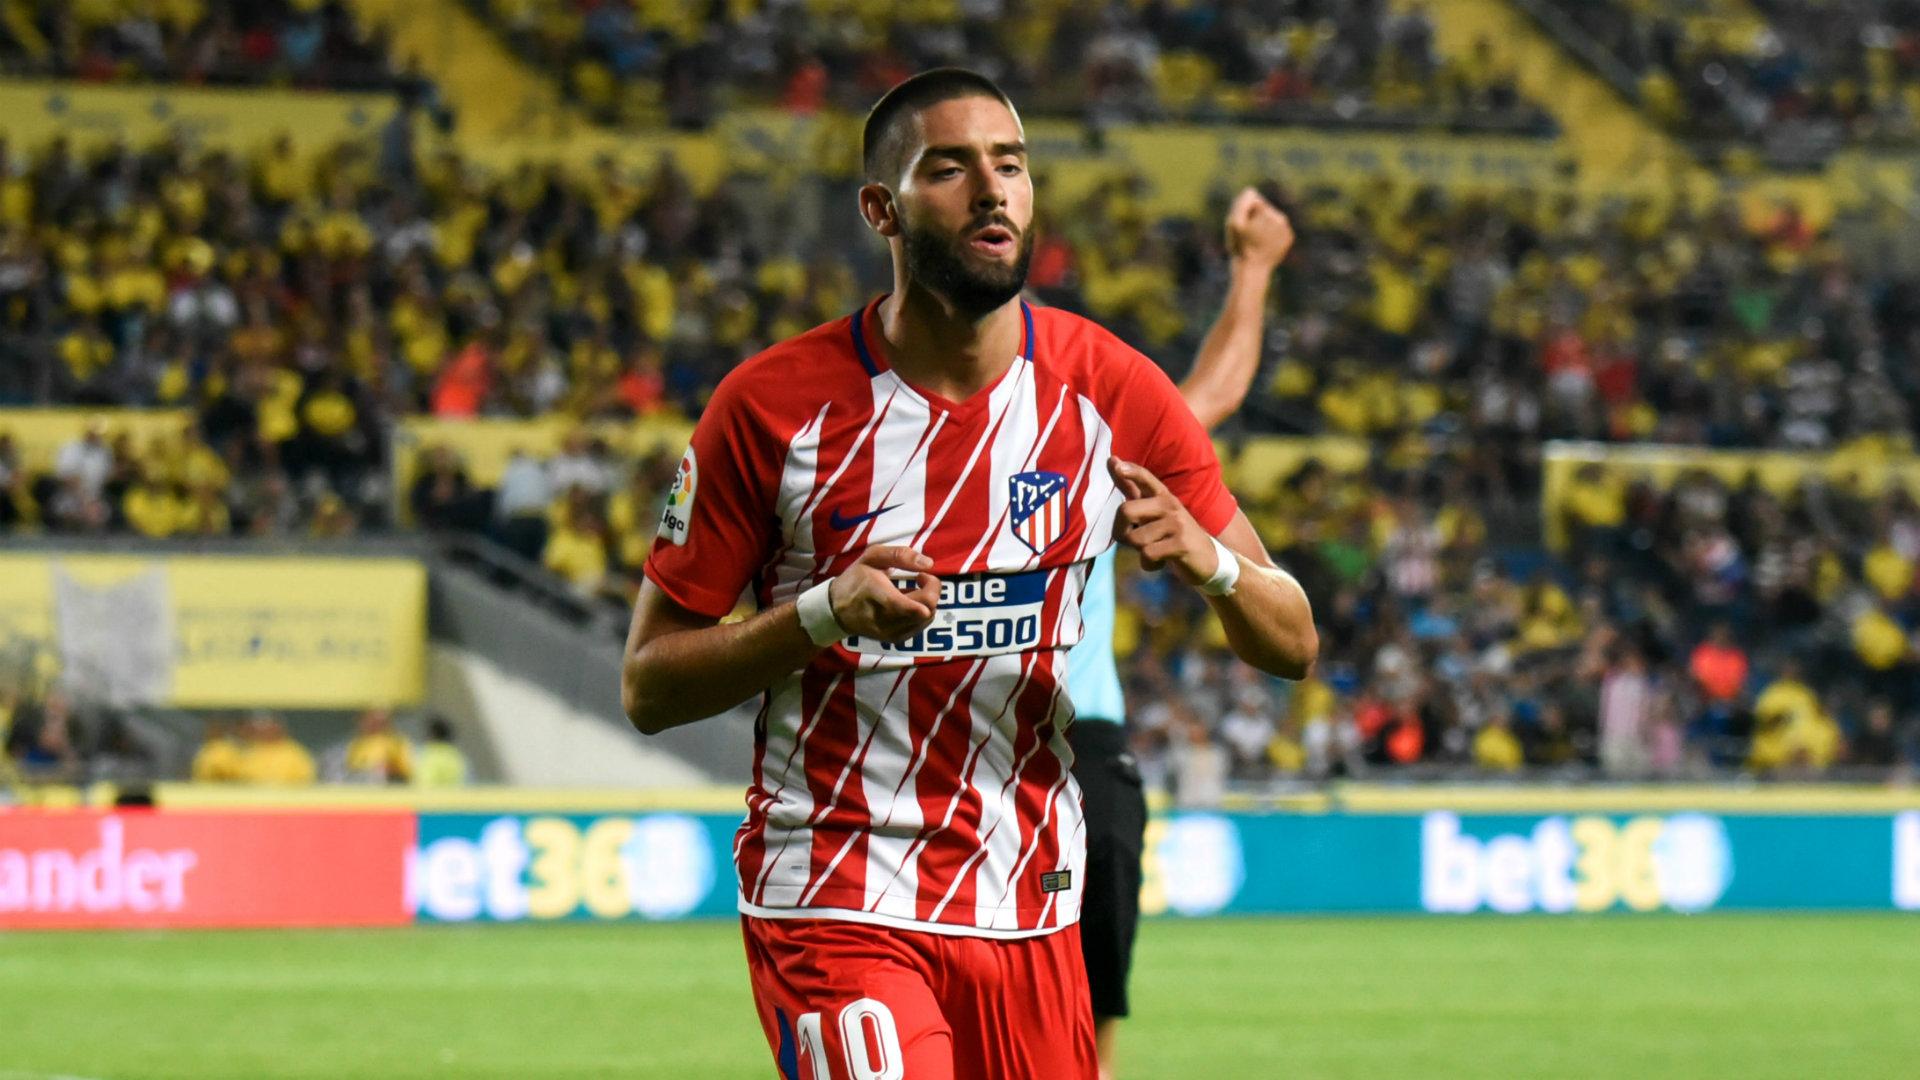 Yannick Carrasco Las Palmas Atletico Madrid 26/08/2017